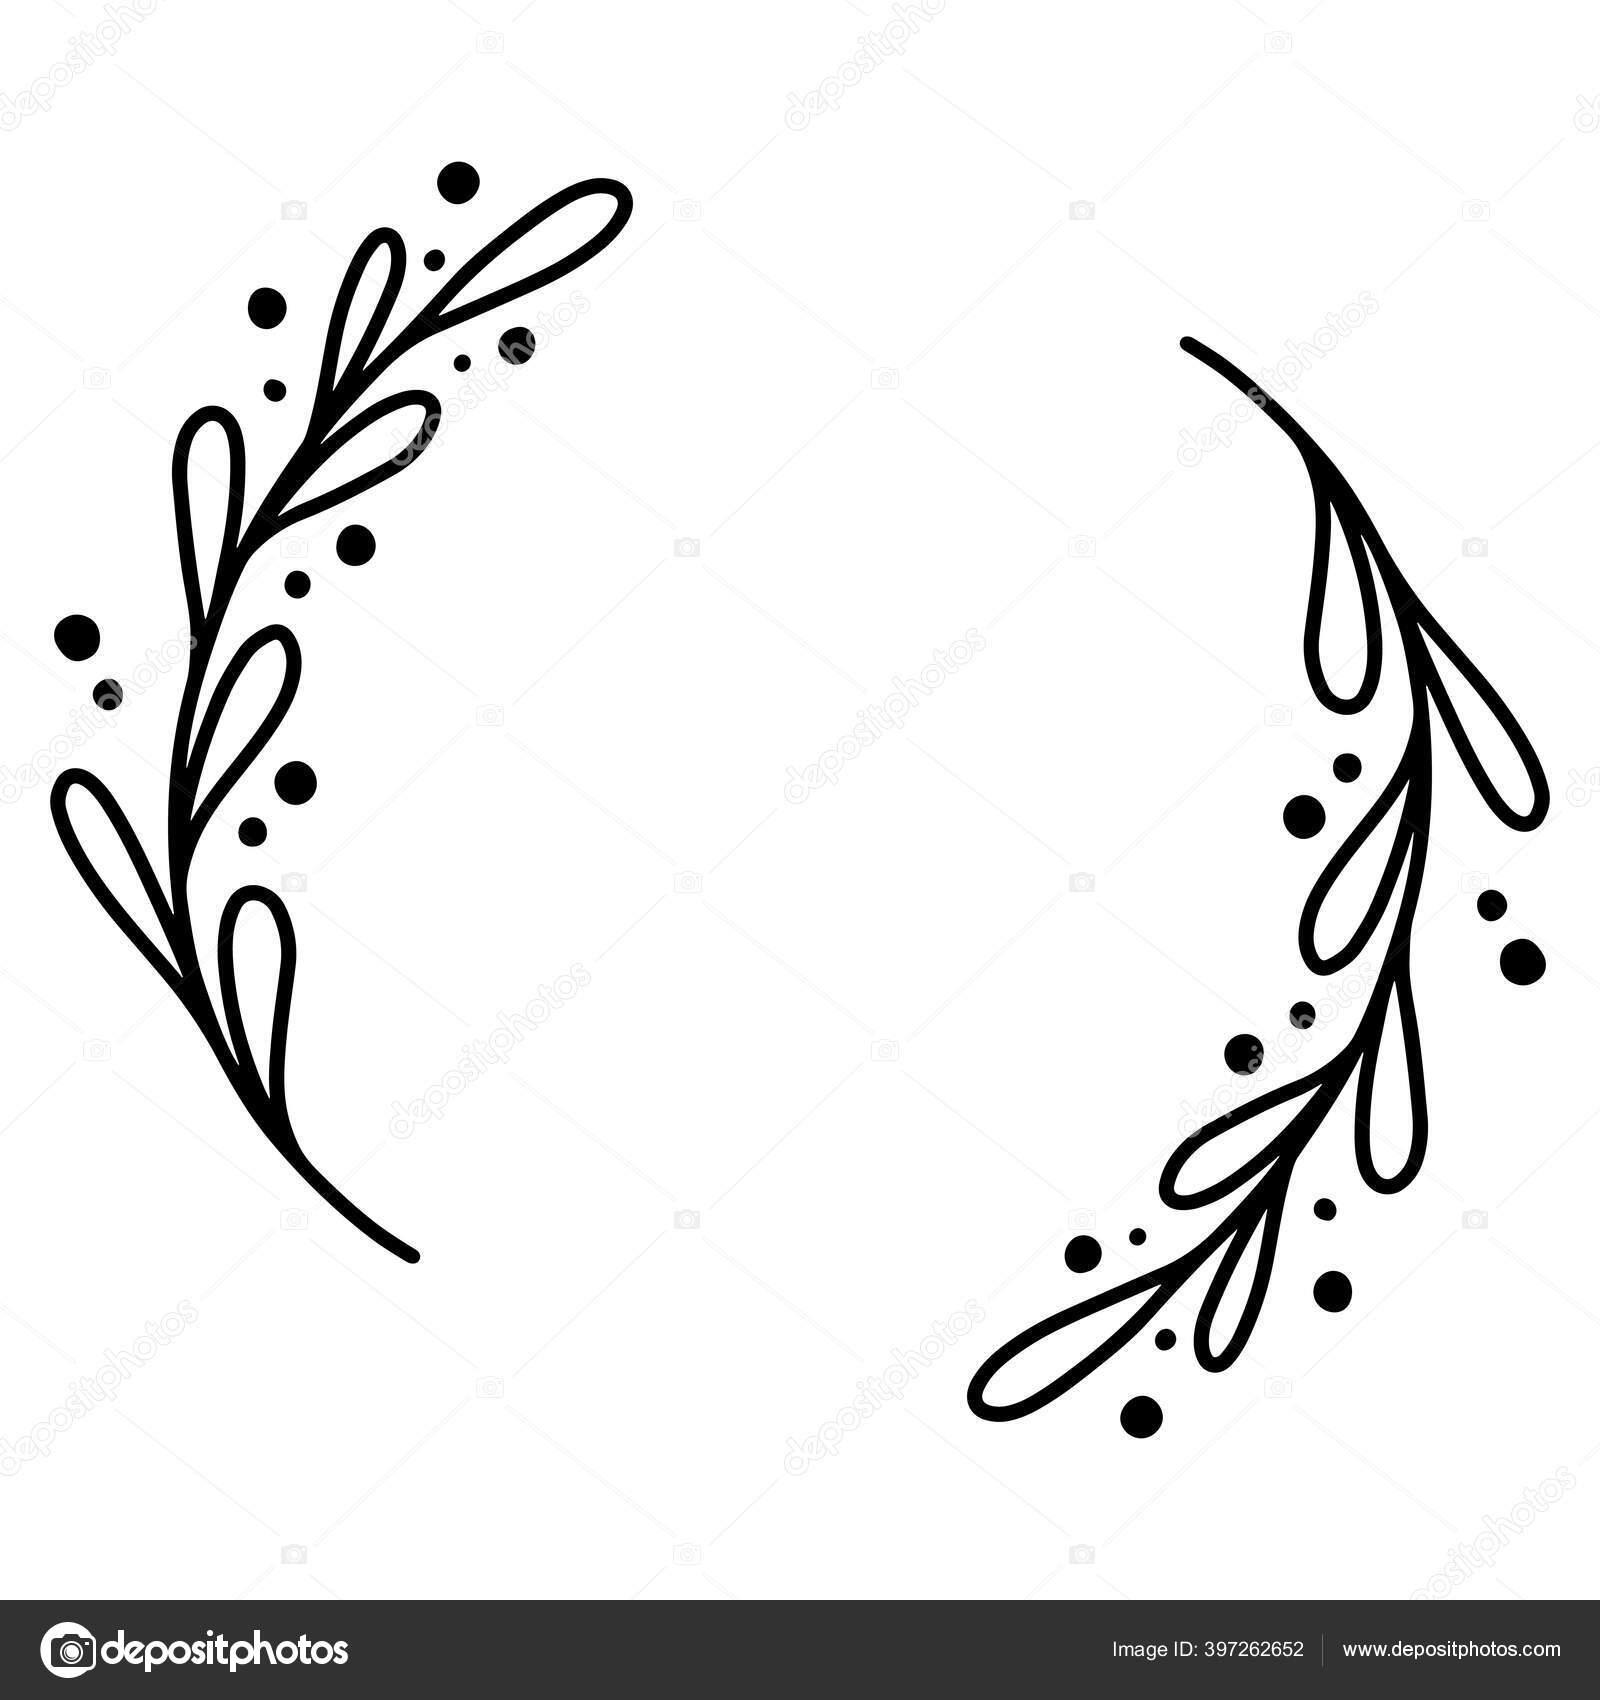 bingkai bunga dengan gambar tangan 0017 stok vektor c wanchana365 397262652 https id depositphotos com 397262652 stock illustration 0017 hand drawn floral frame html